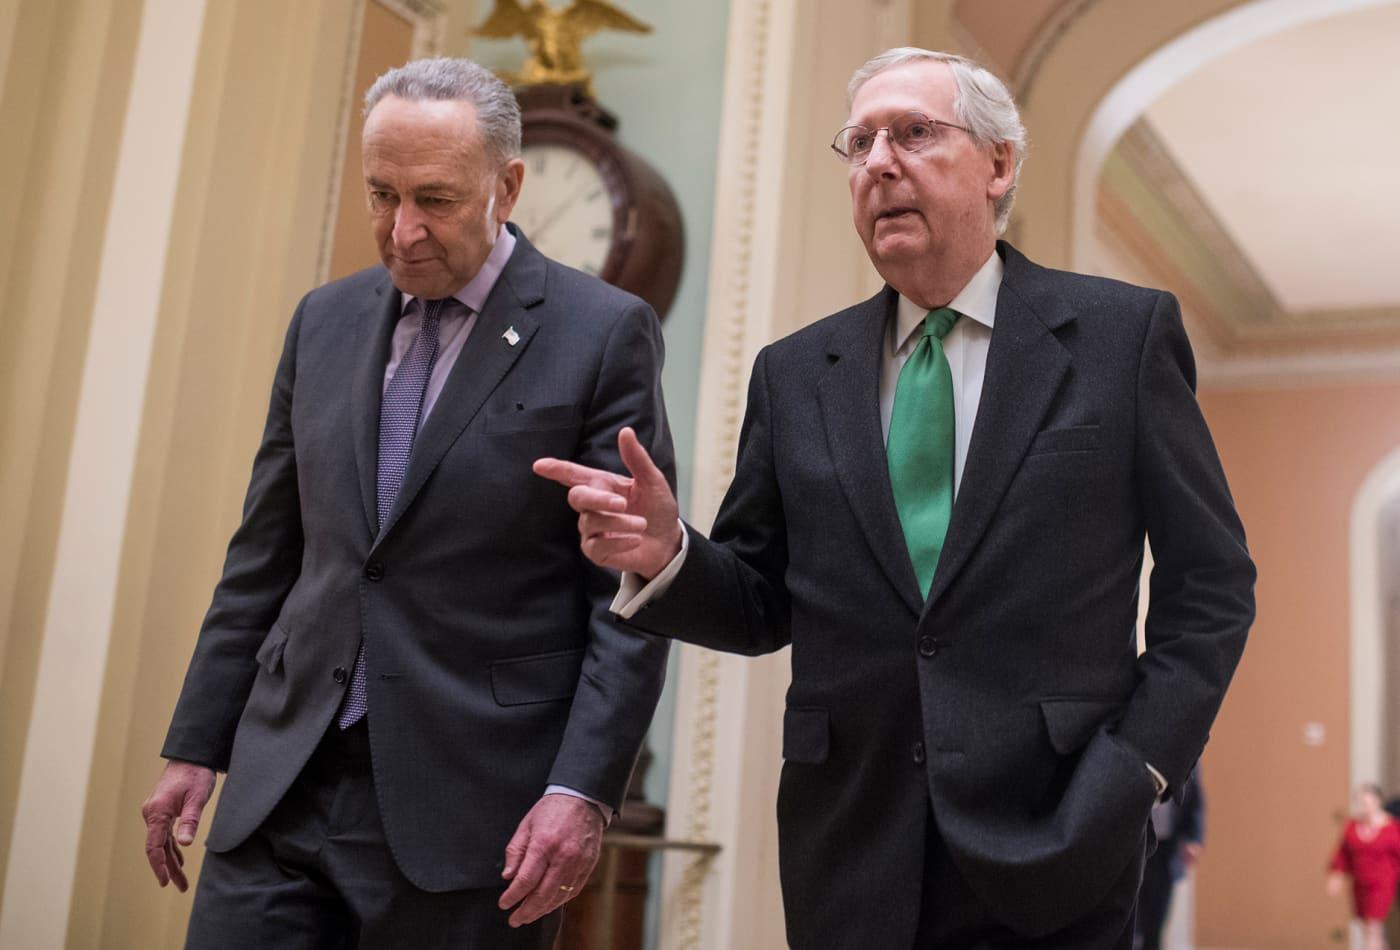 Senate passes $2 trillion coronavirus stimulus package, sending it to the House